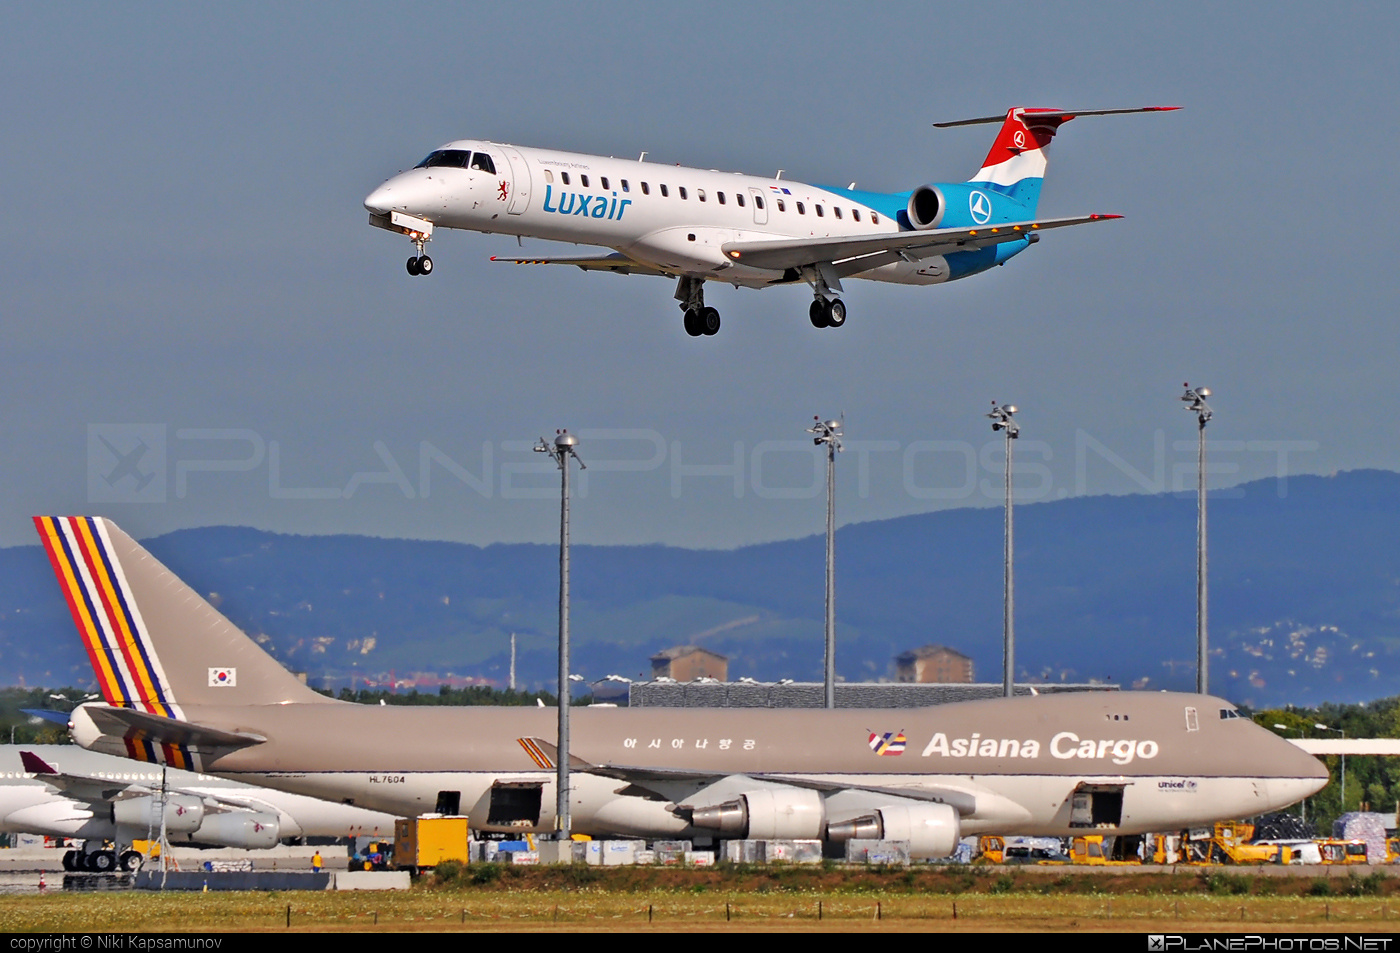 Embraer ERJ-145LU - LX-LGJ operated by Luxair #embraer